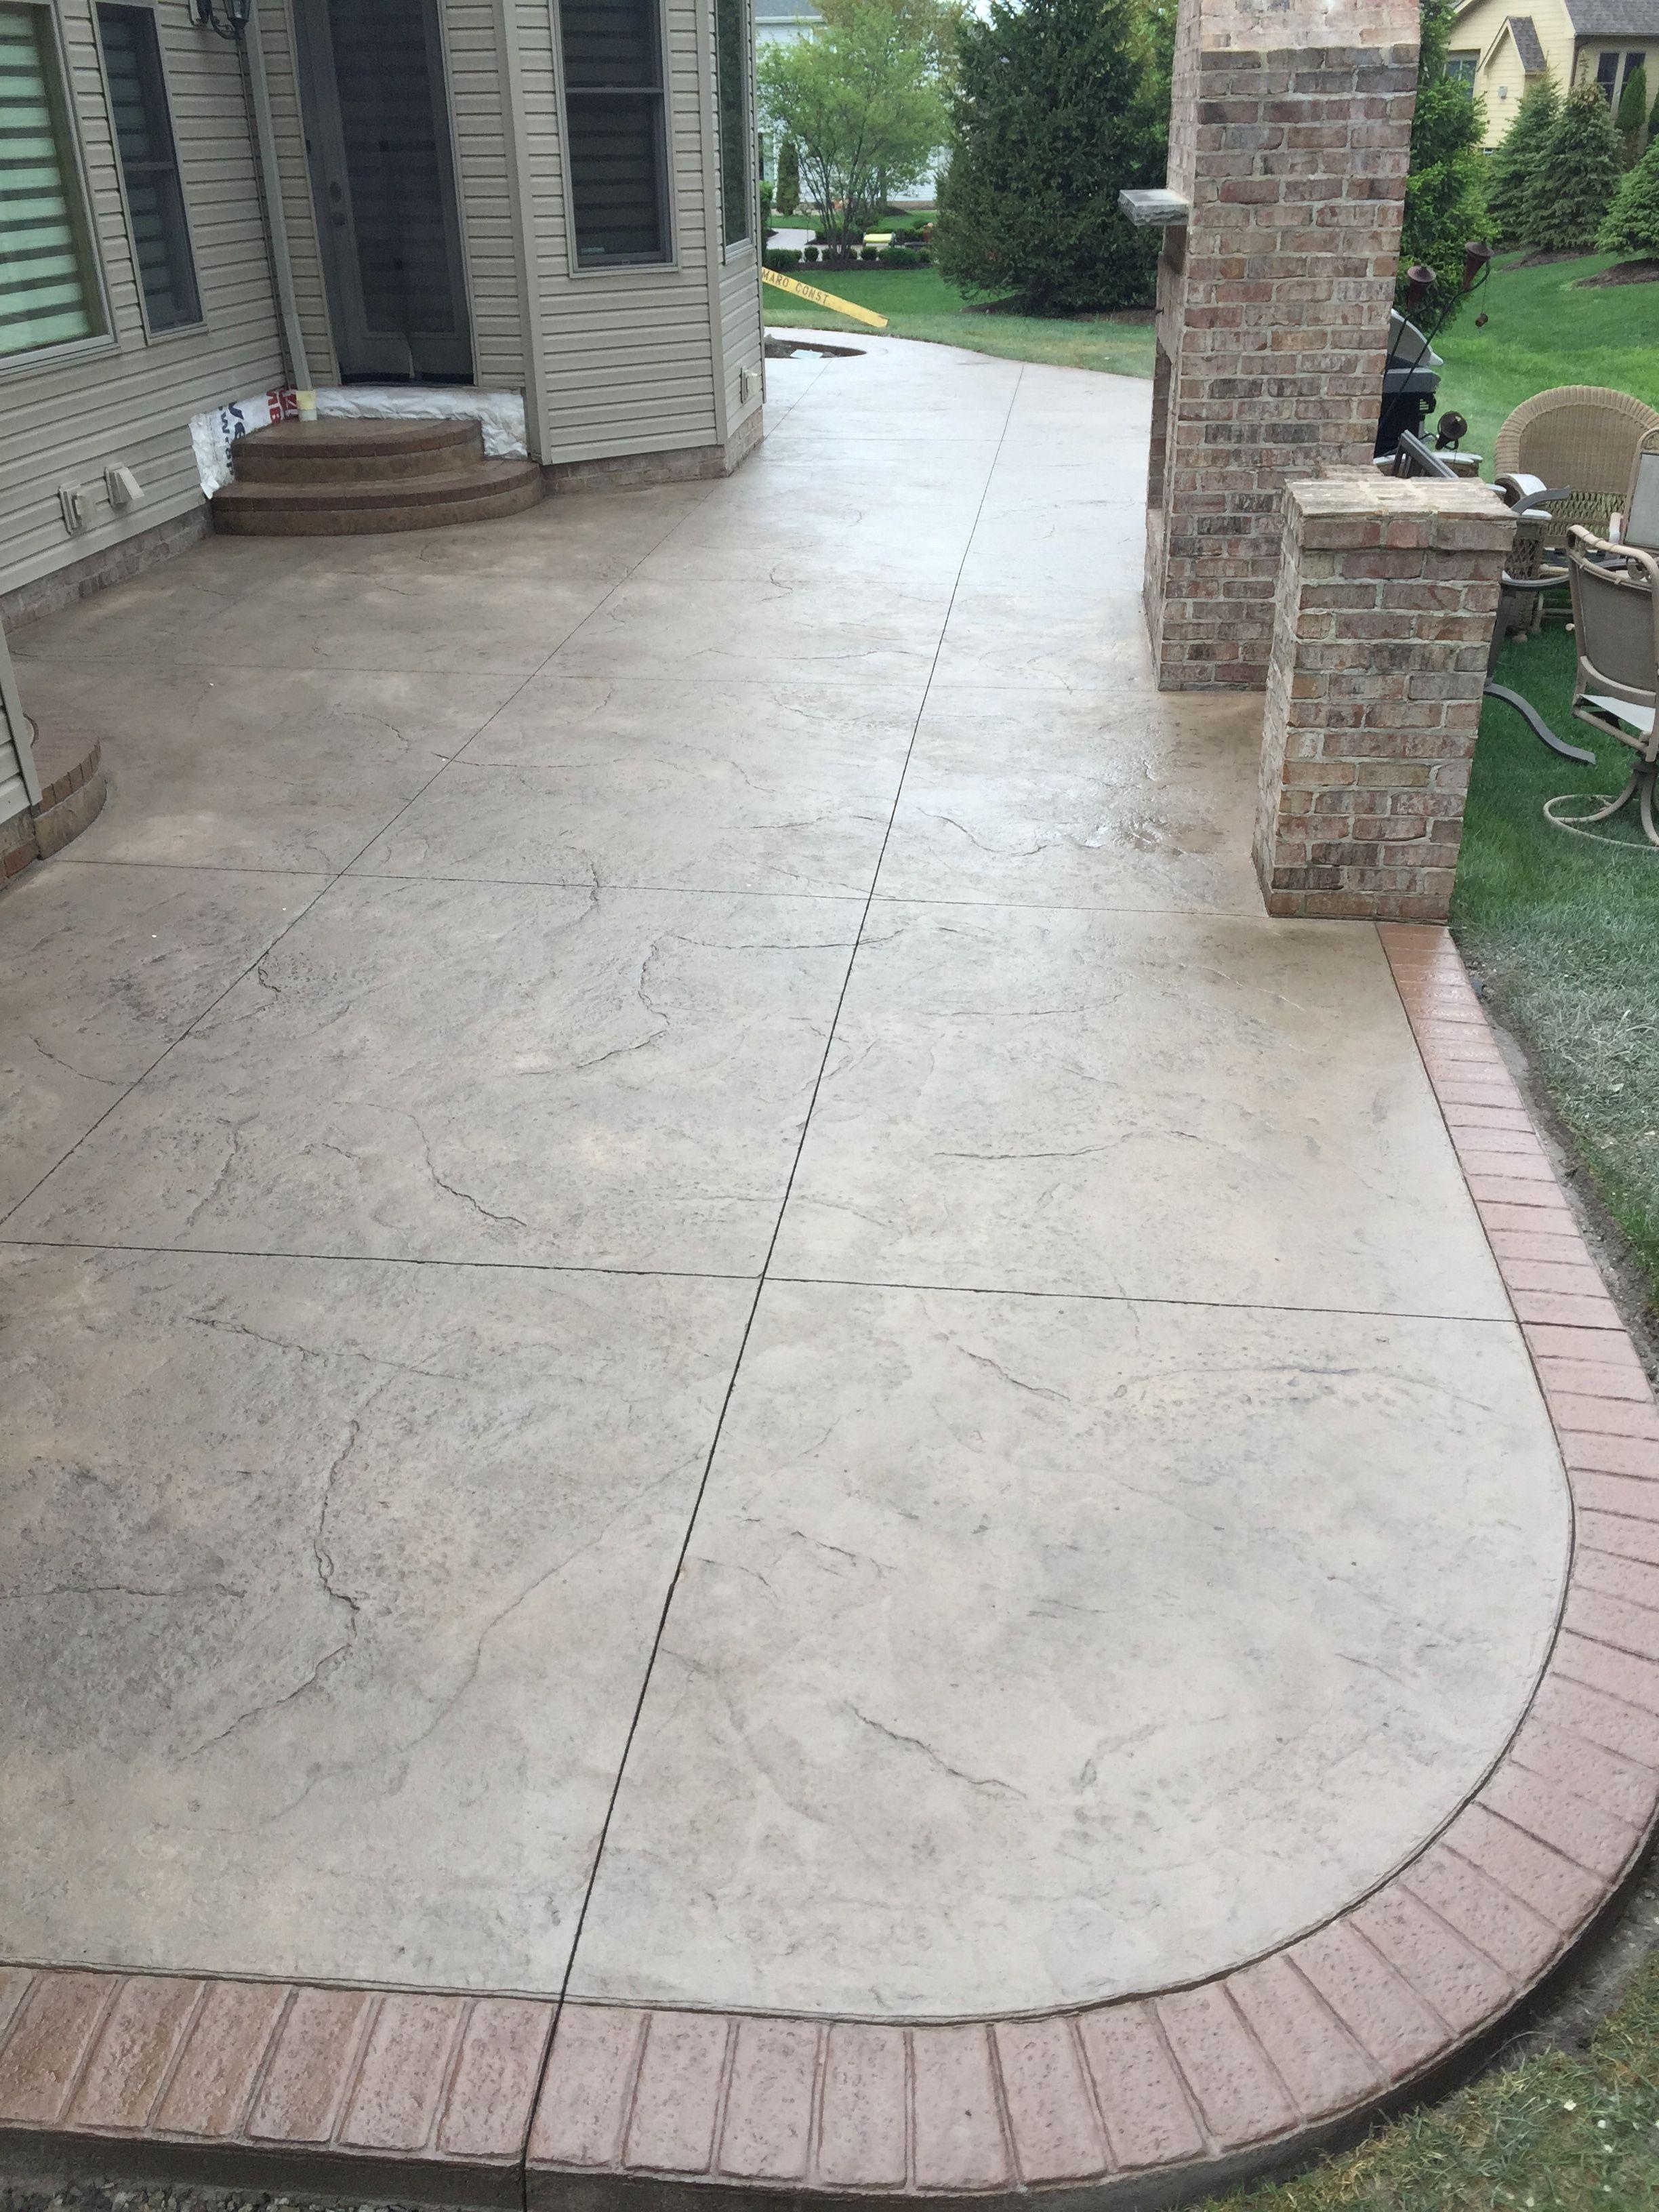 Stamped patio w 2 sets of landingssteps w matching brick borders  facing on landingssteps